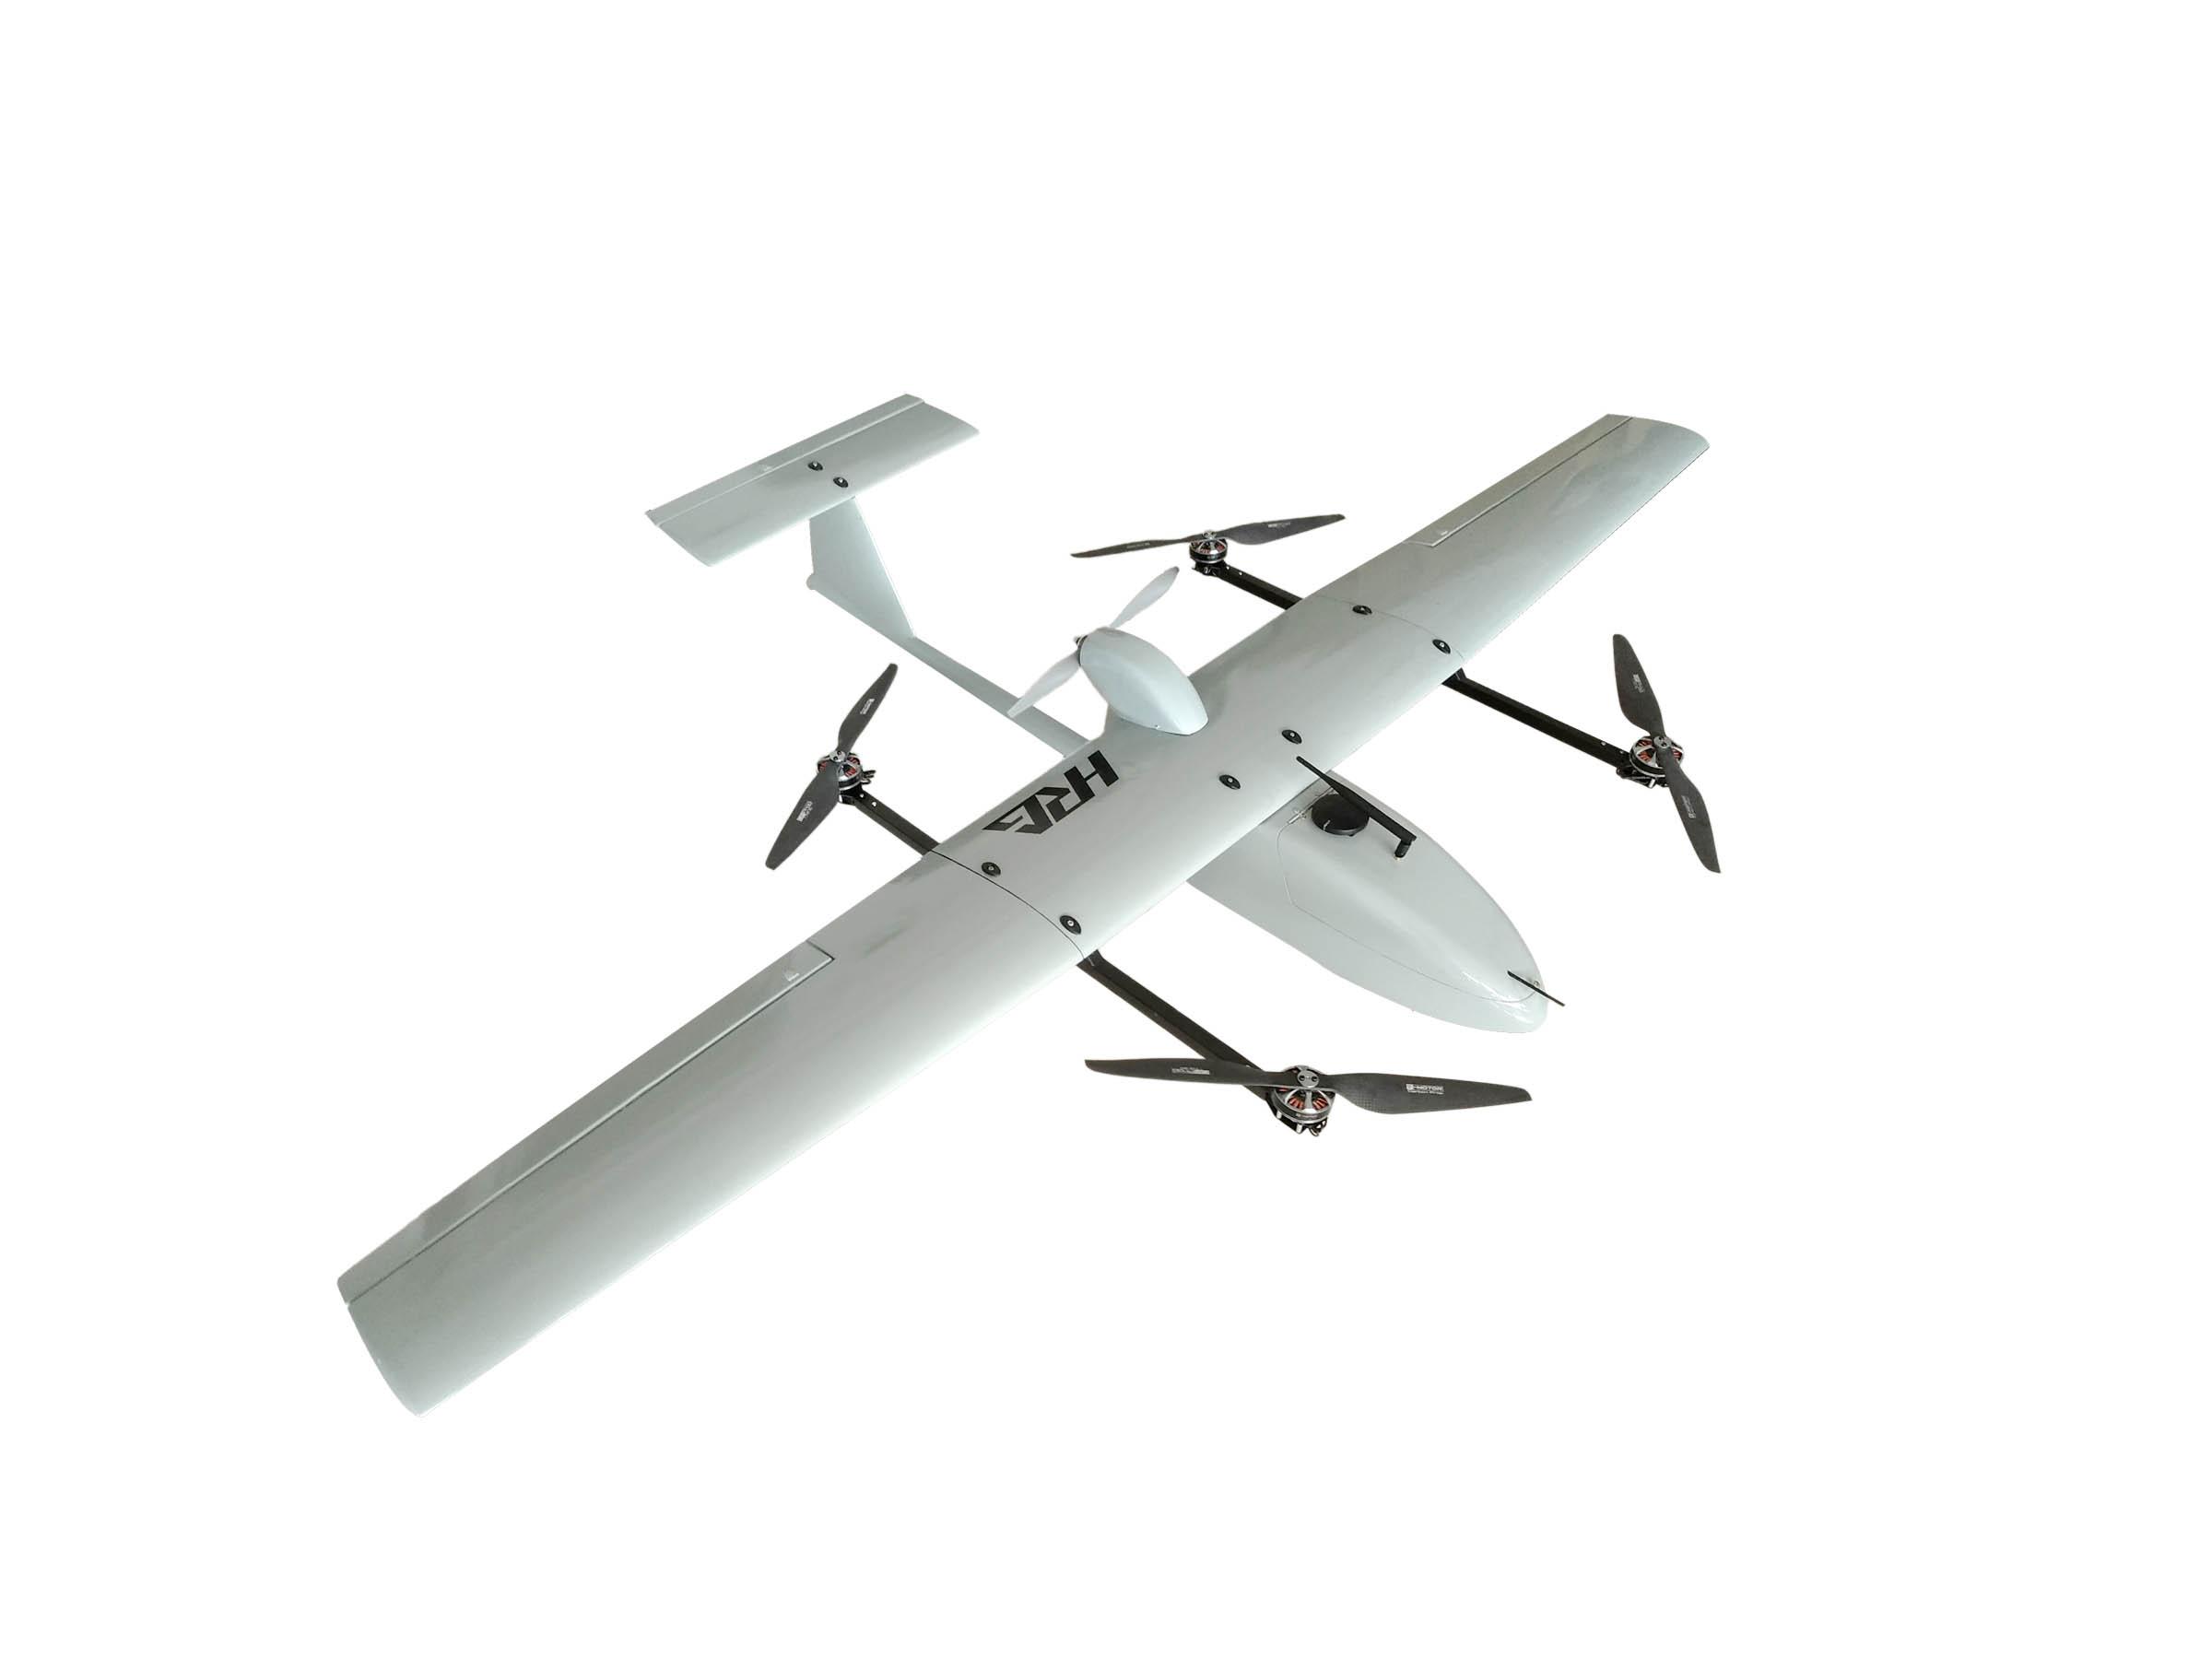 AE70小型垂直起降电动无人机